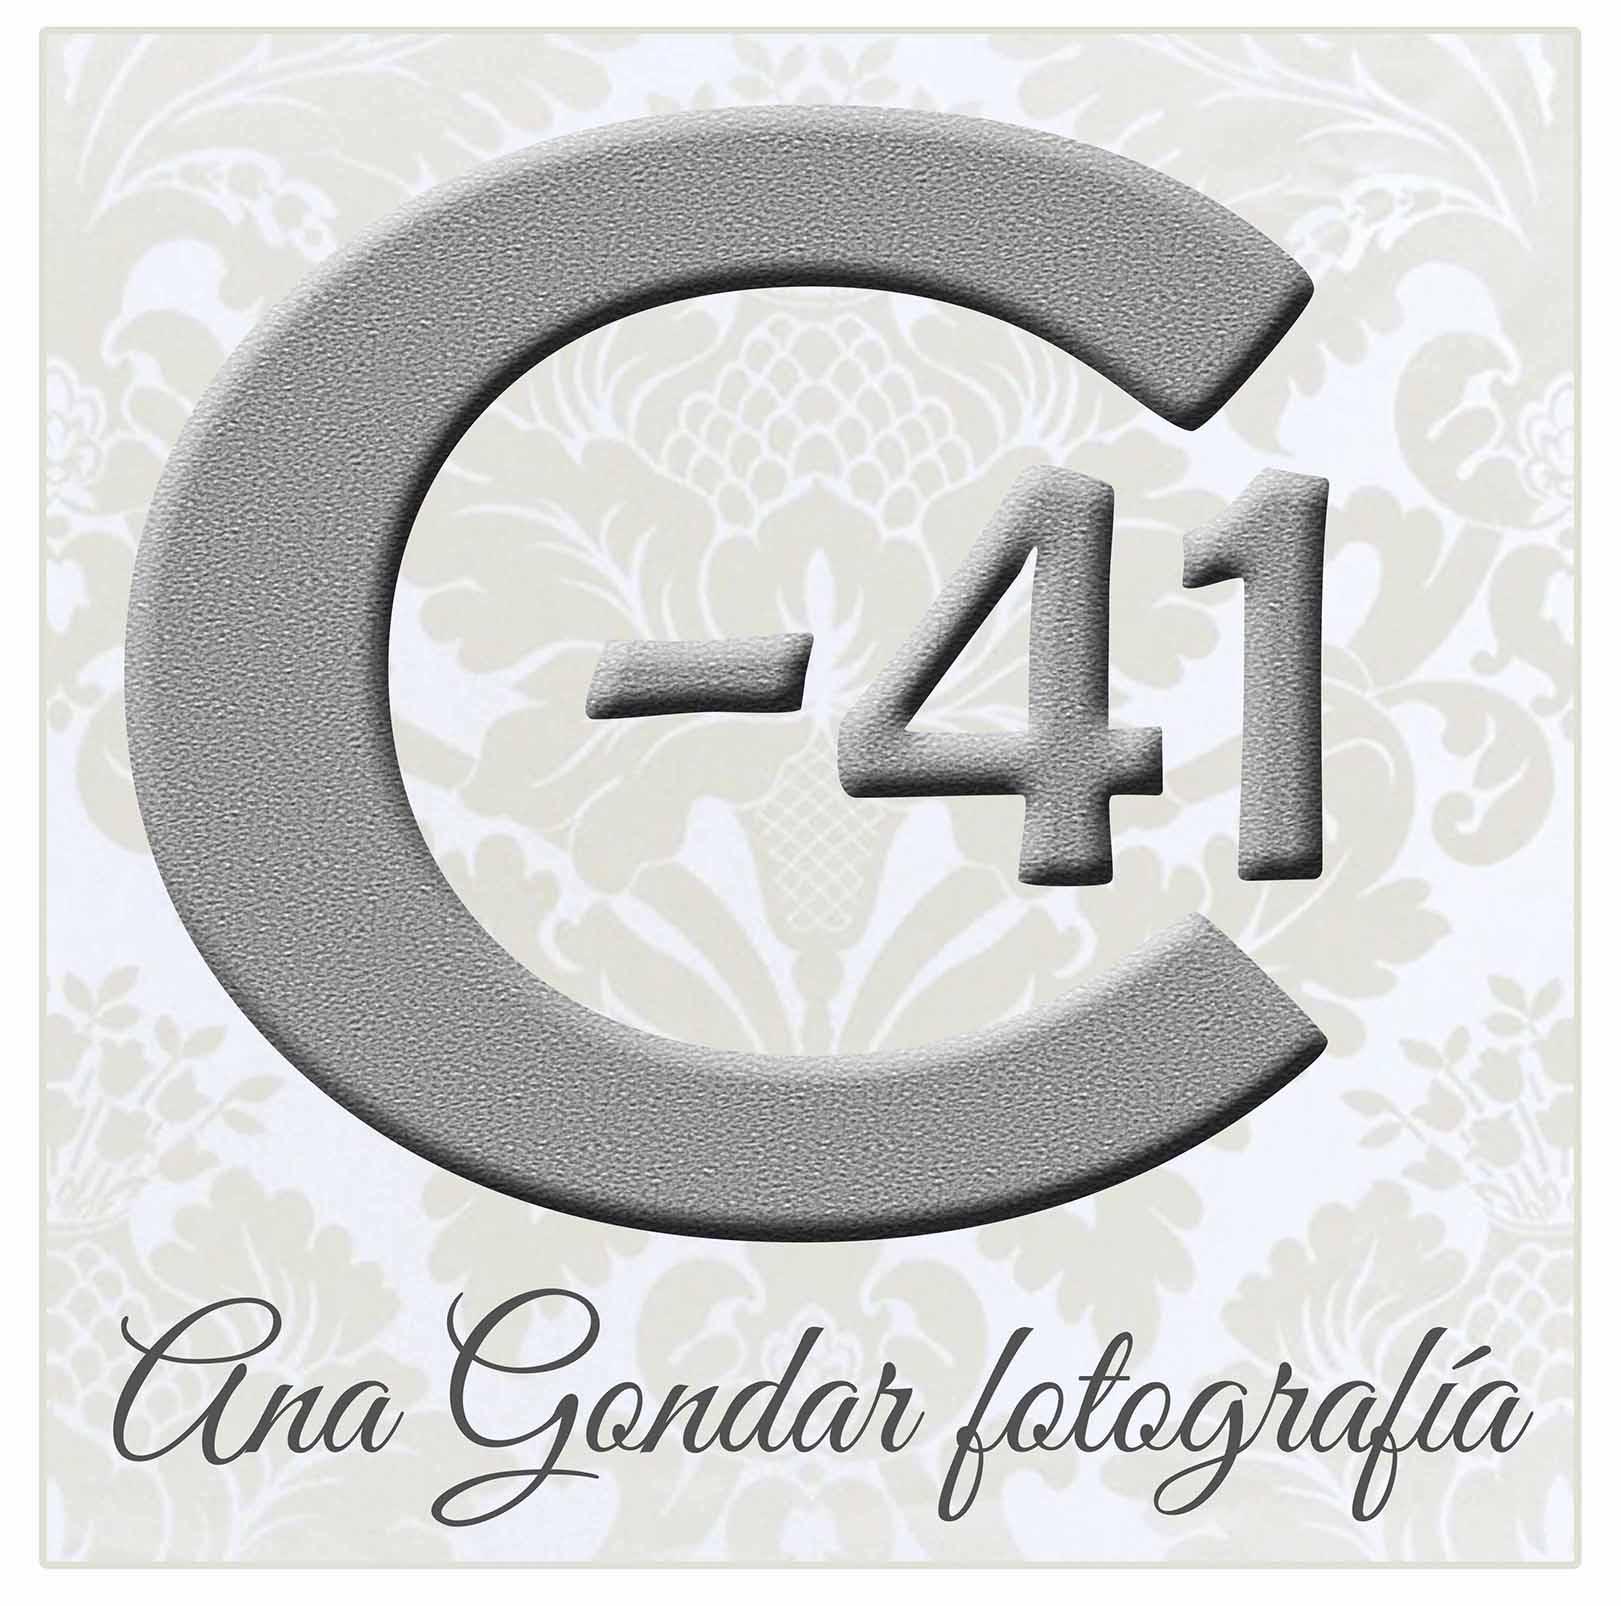 Logotipo Centro de Revelado C-41